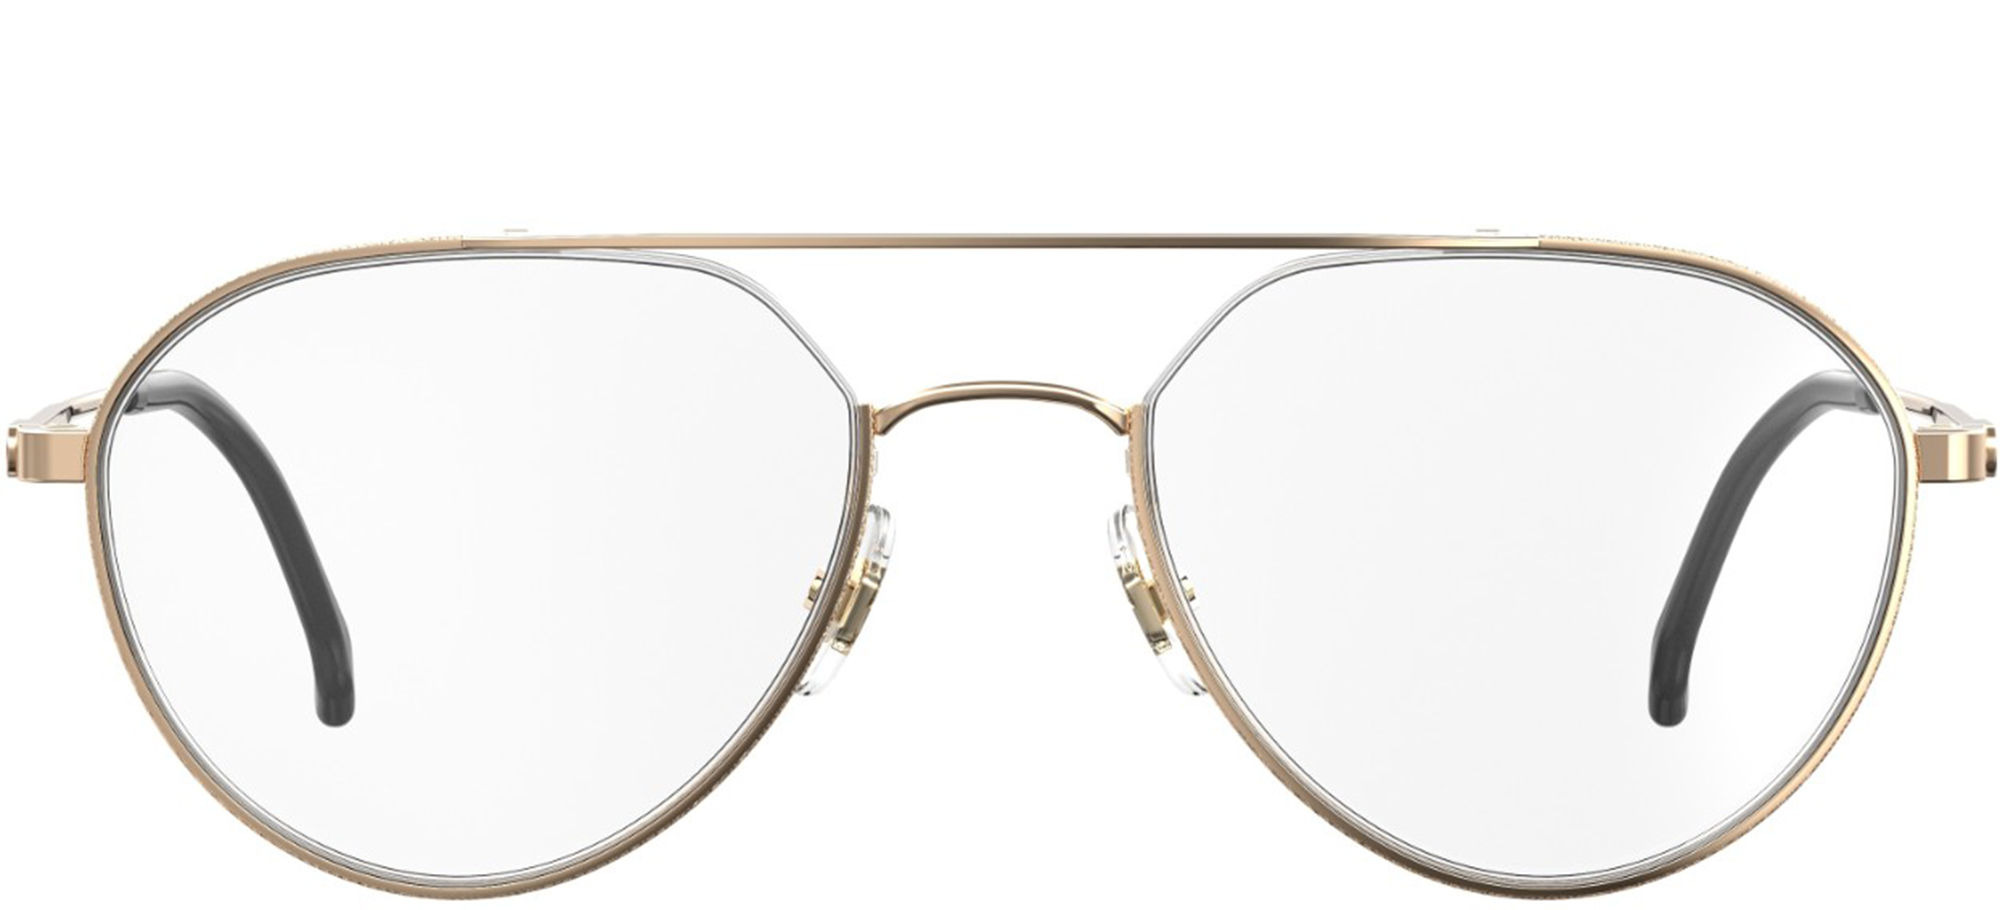 Carrera CARRERA 1110 PALLADIUM 55//19//145 unisex Eyewear Frame